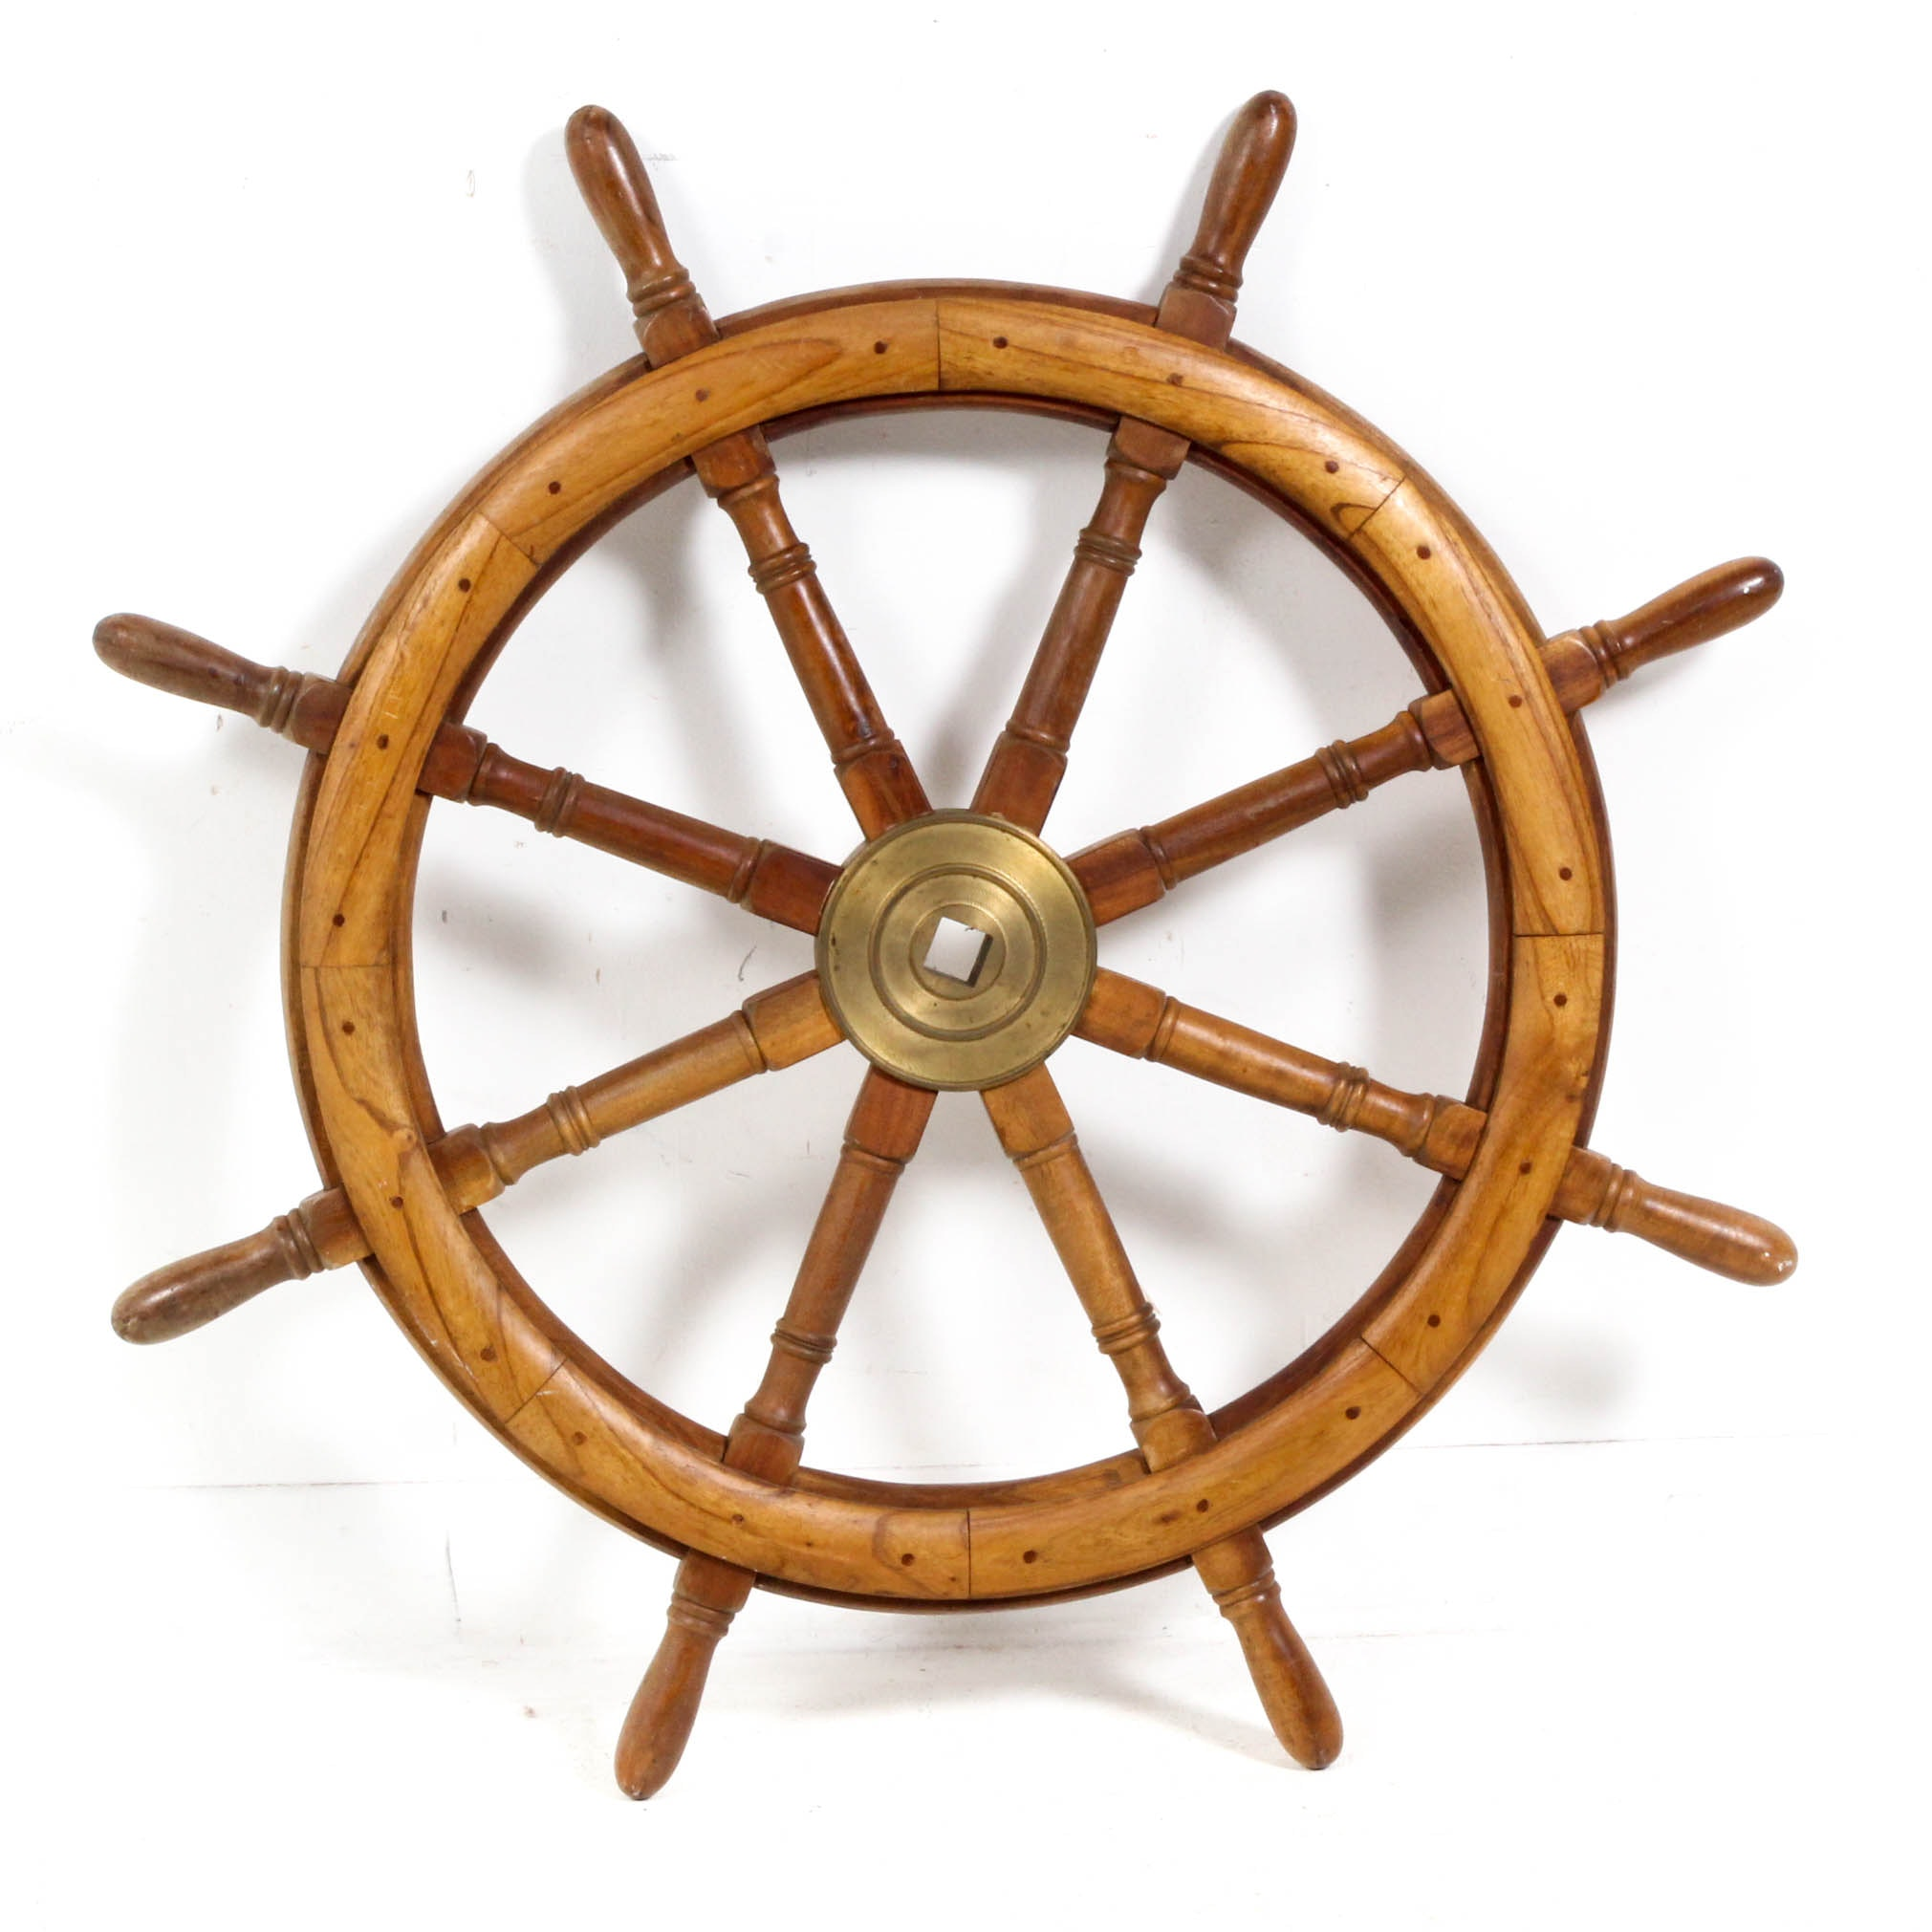 Decorative Wooden Ship's Wheel